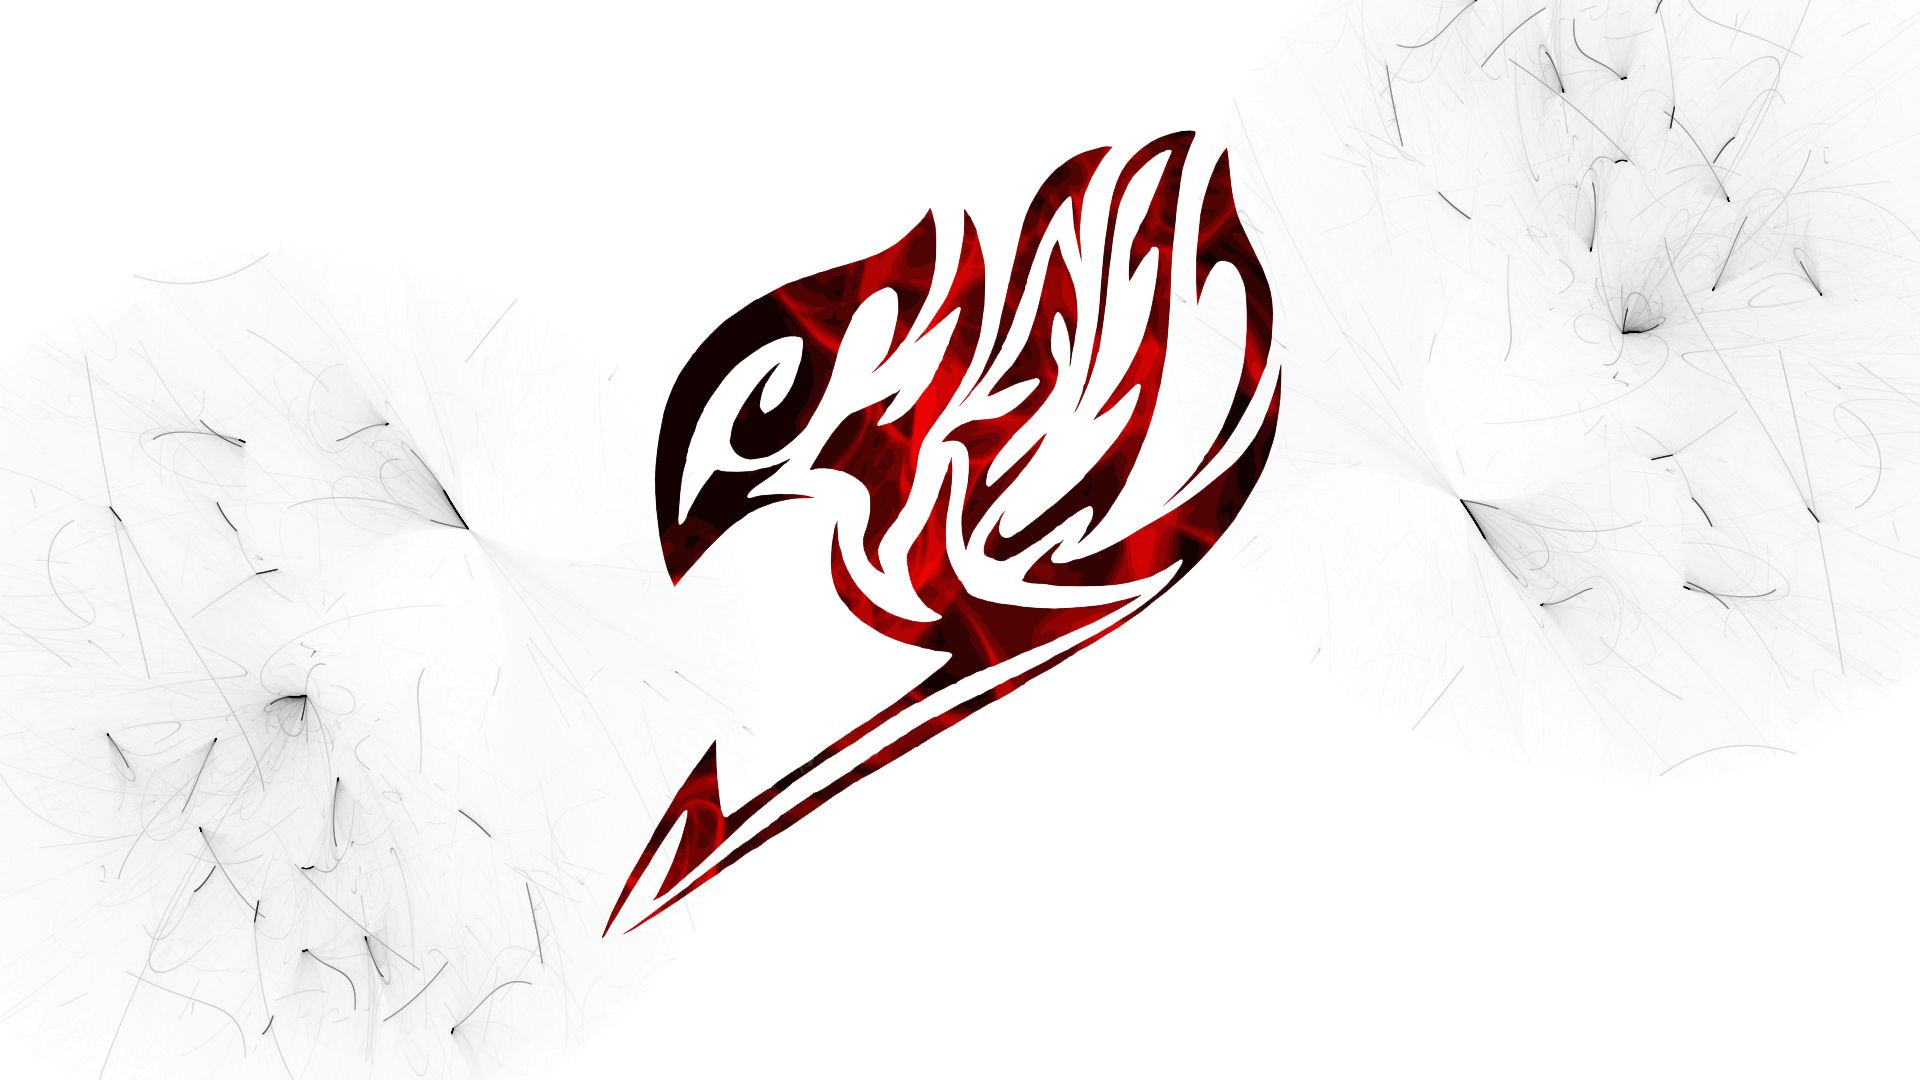 Fairy Tail Logo Desktop Wallpaper Hd - Download Free Mock-up